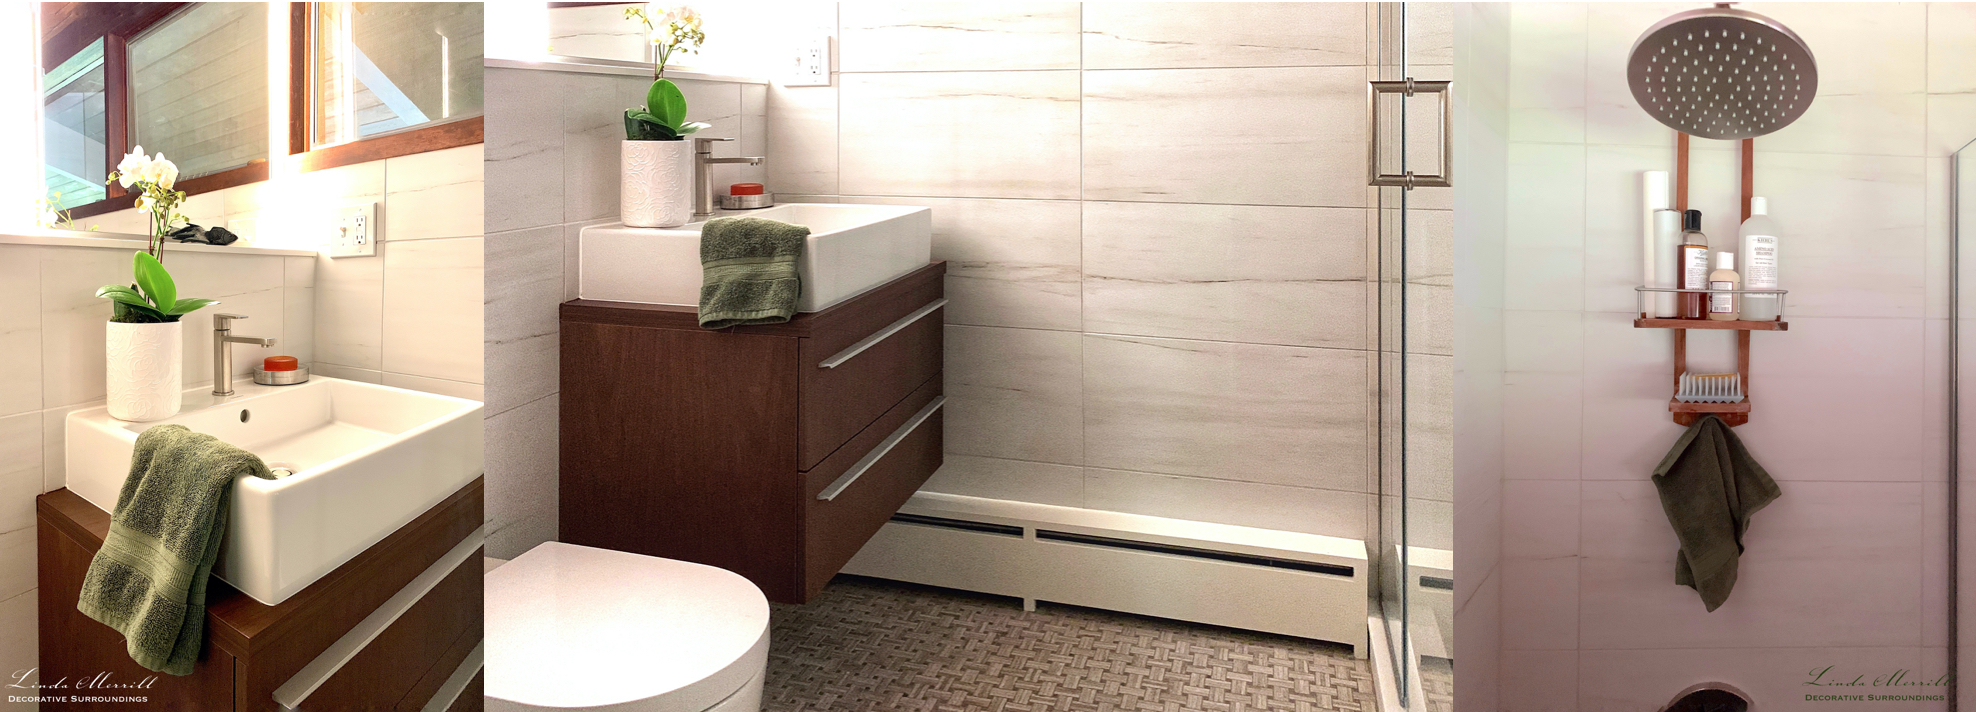 Deck house bathroom blog header